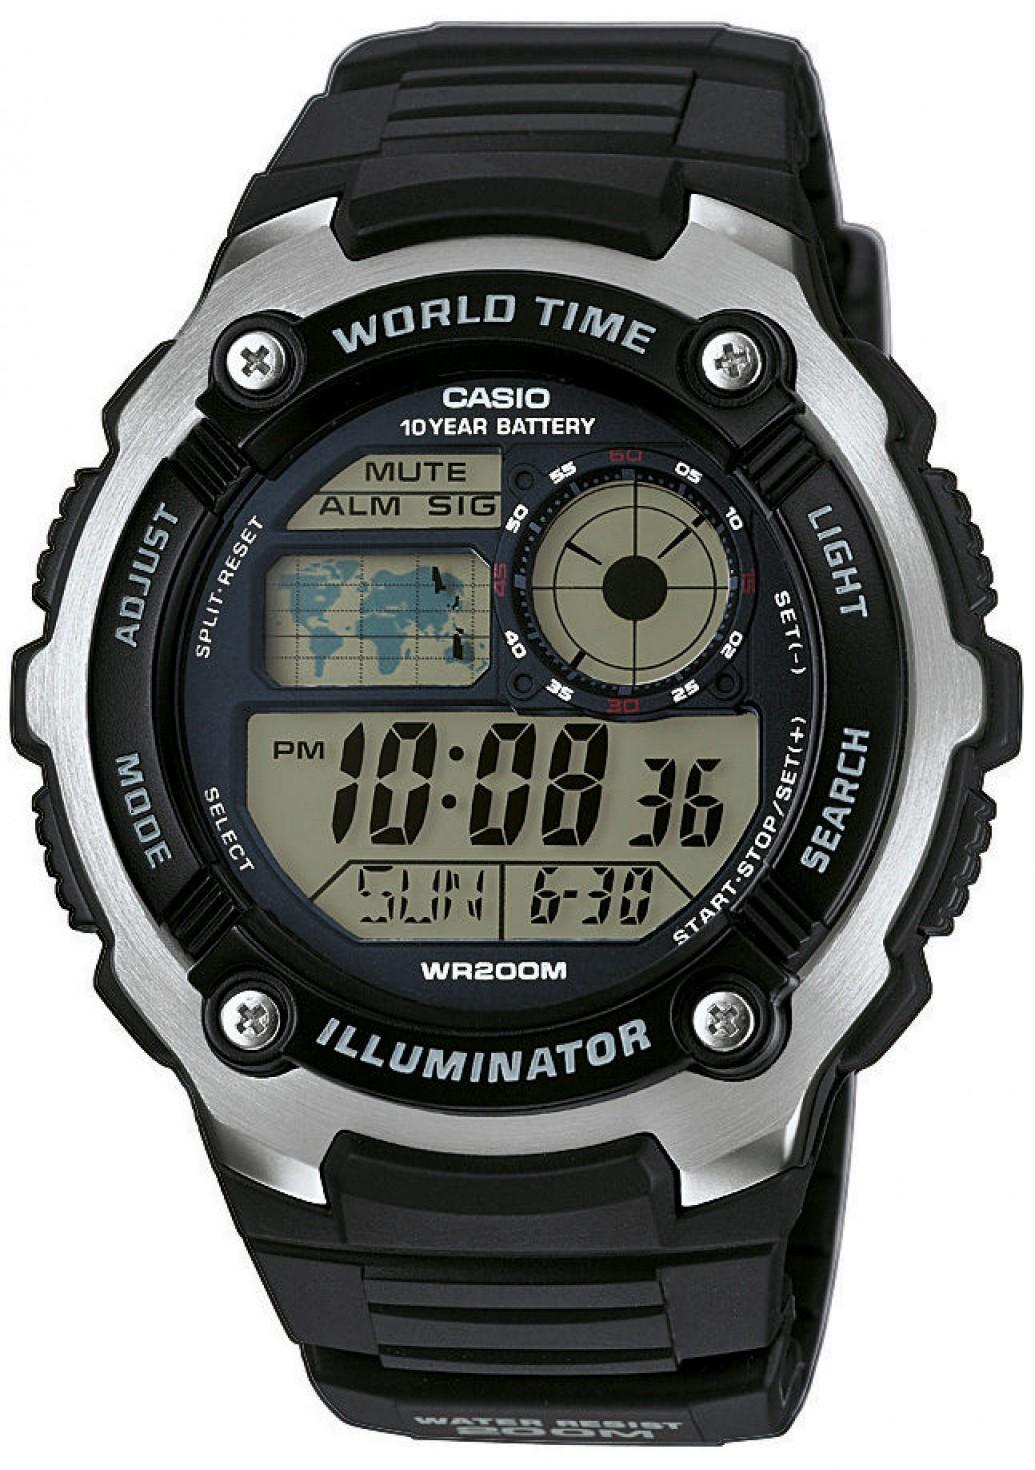 Мужские часы Casio Standard AE-2100W-1AVEF